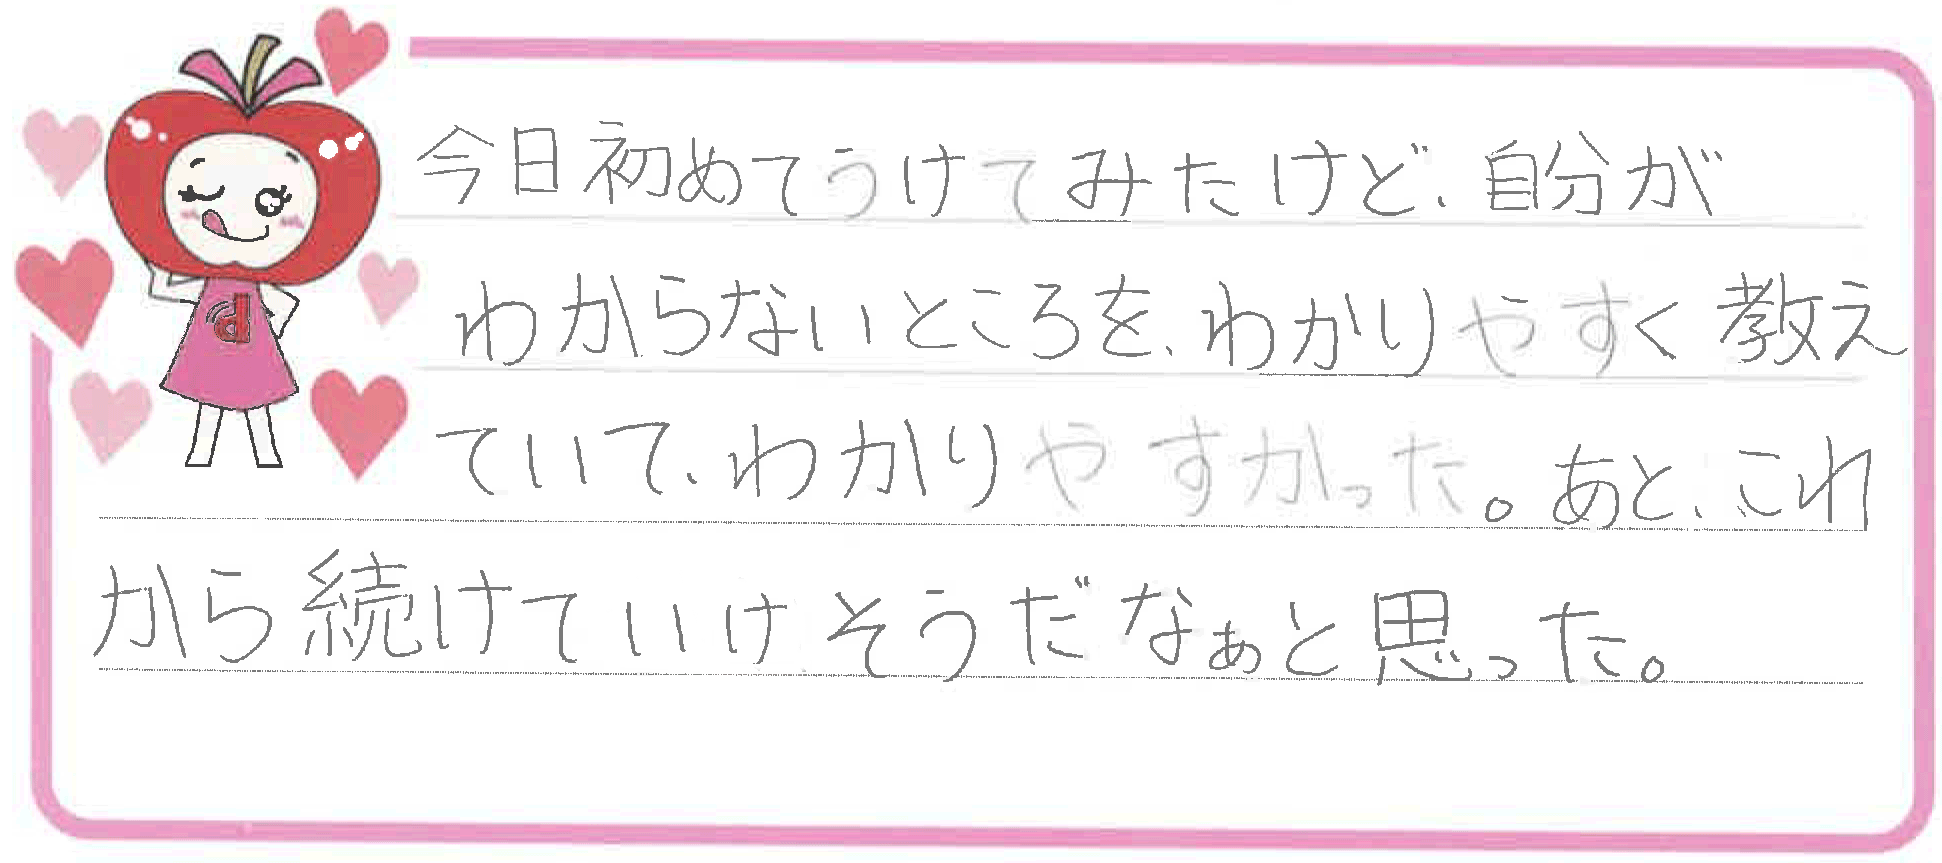 Mちゃん(松阪市)からの口コミ